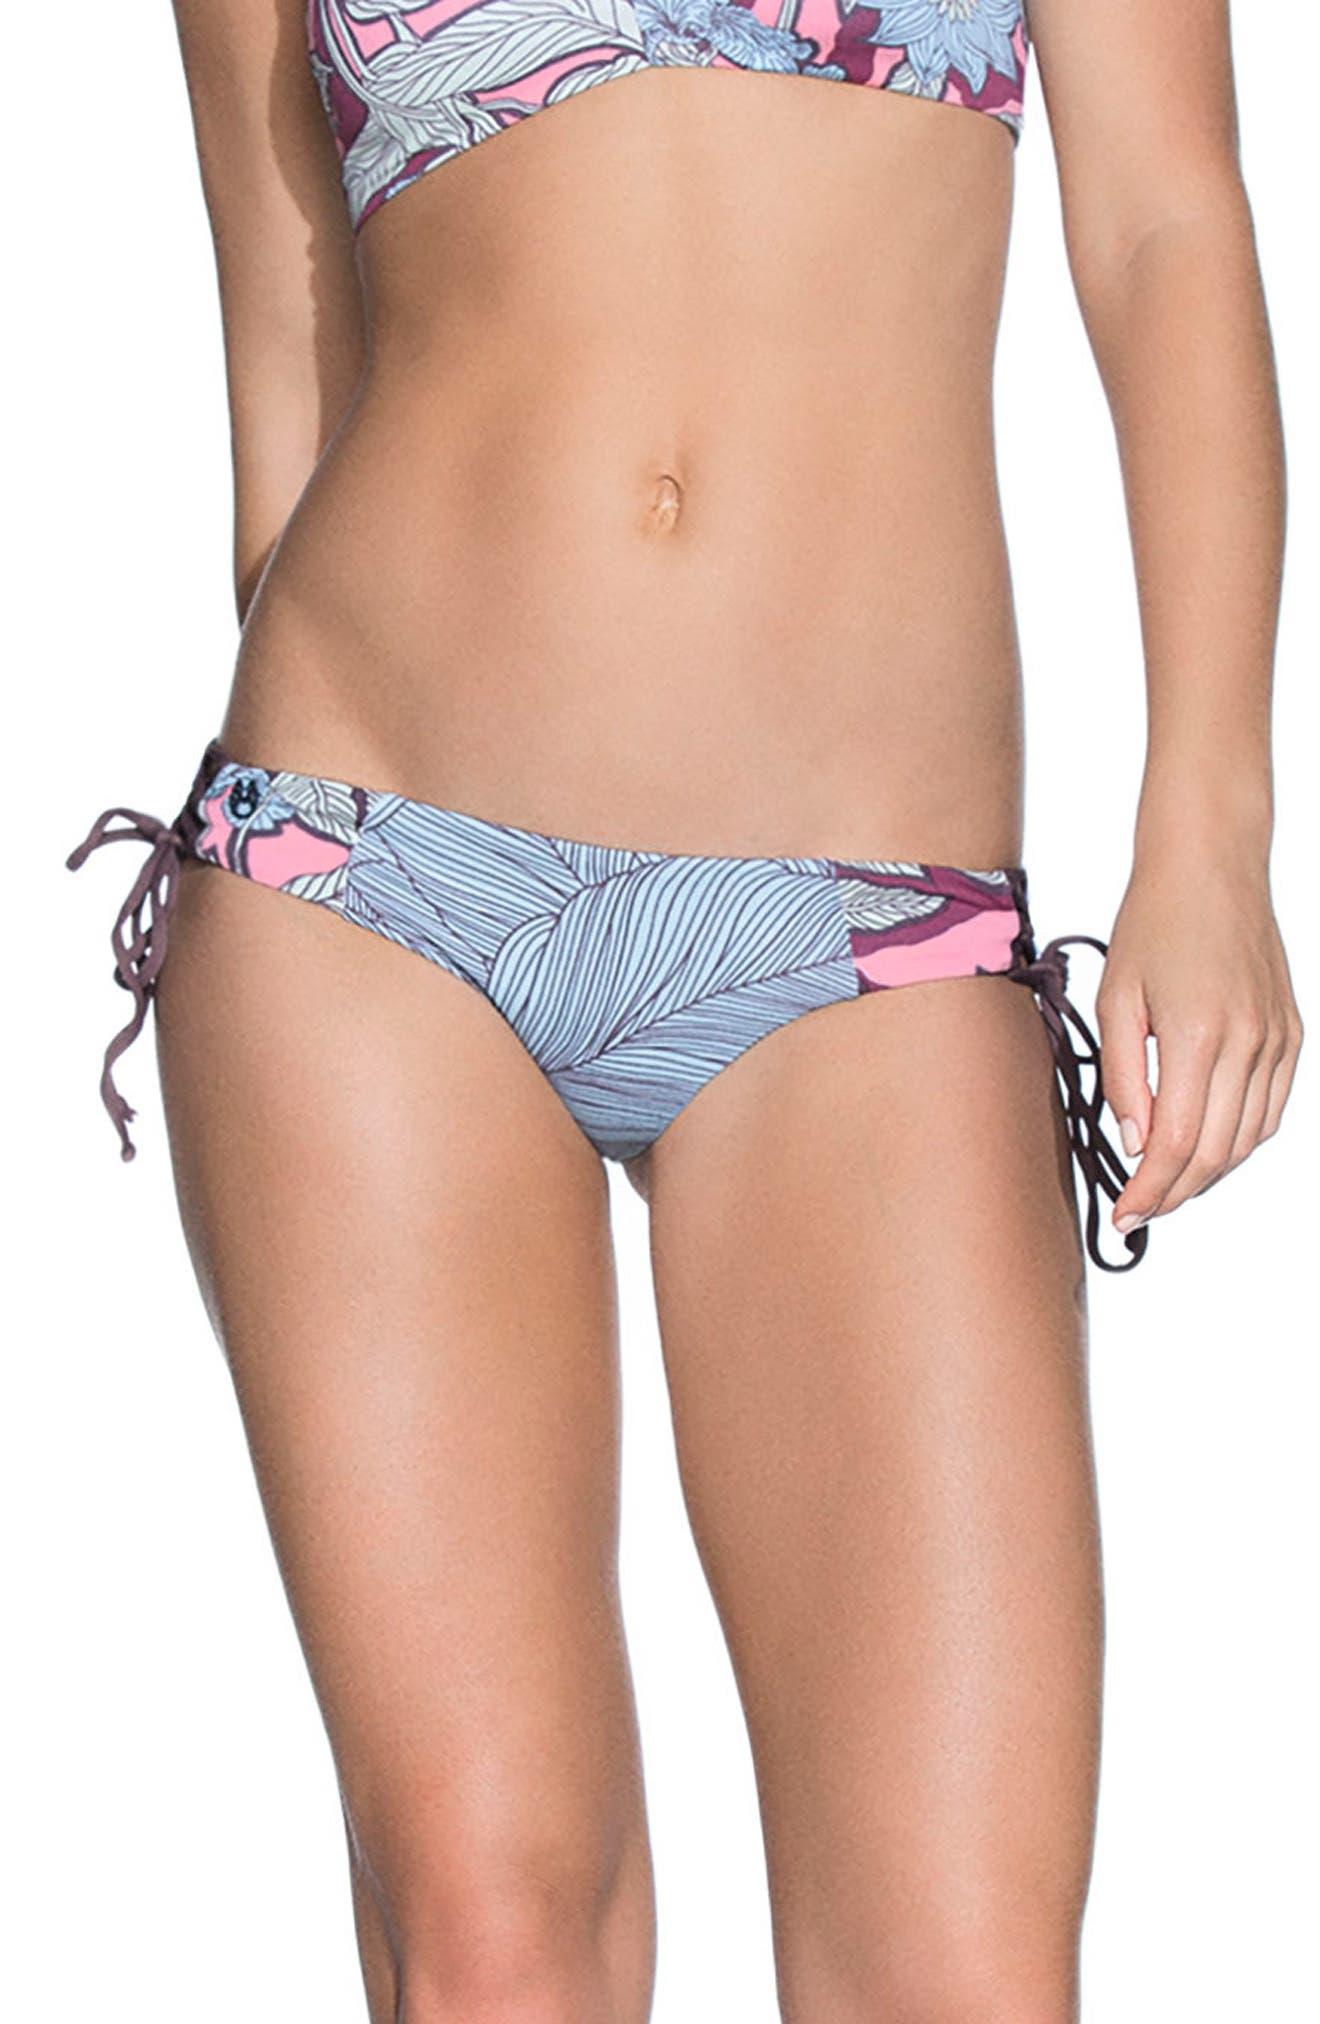 Providence Island Signature Rervsible Bikini Bottoms,                             Main thumbnail 1, color,                             400